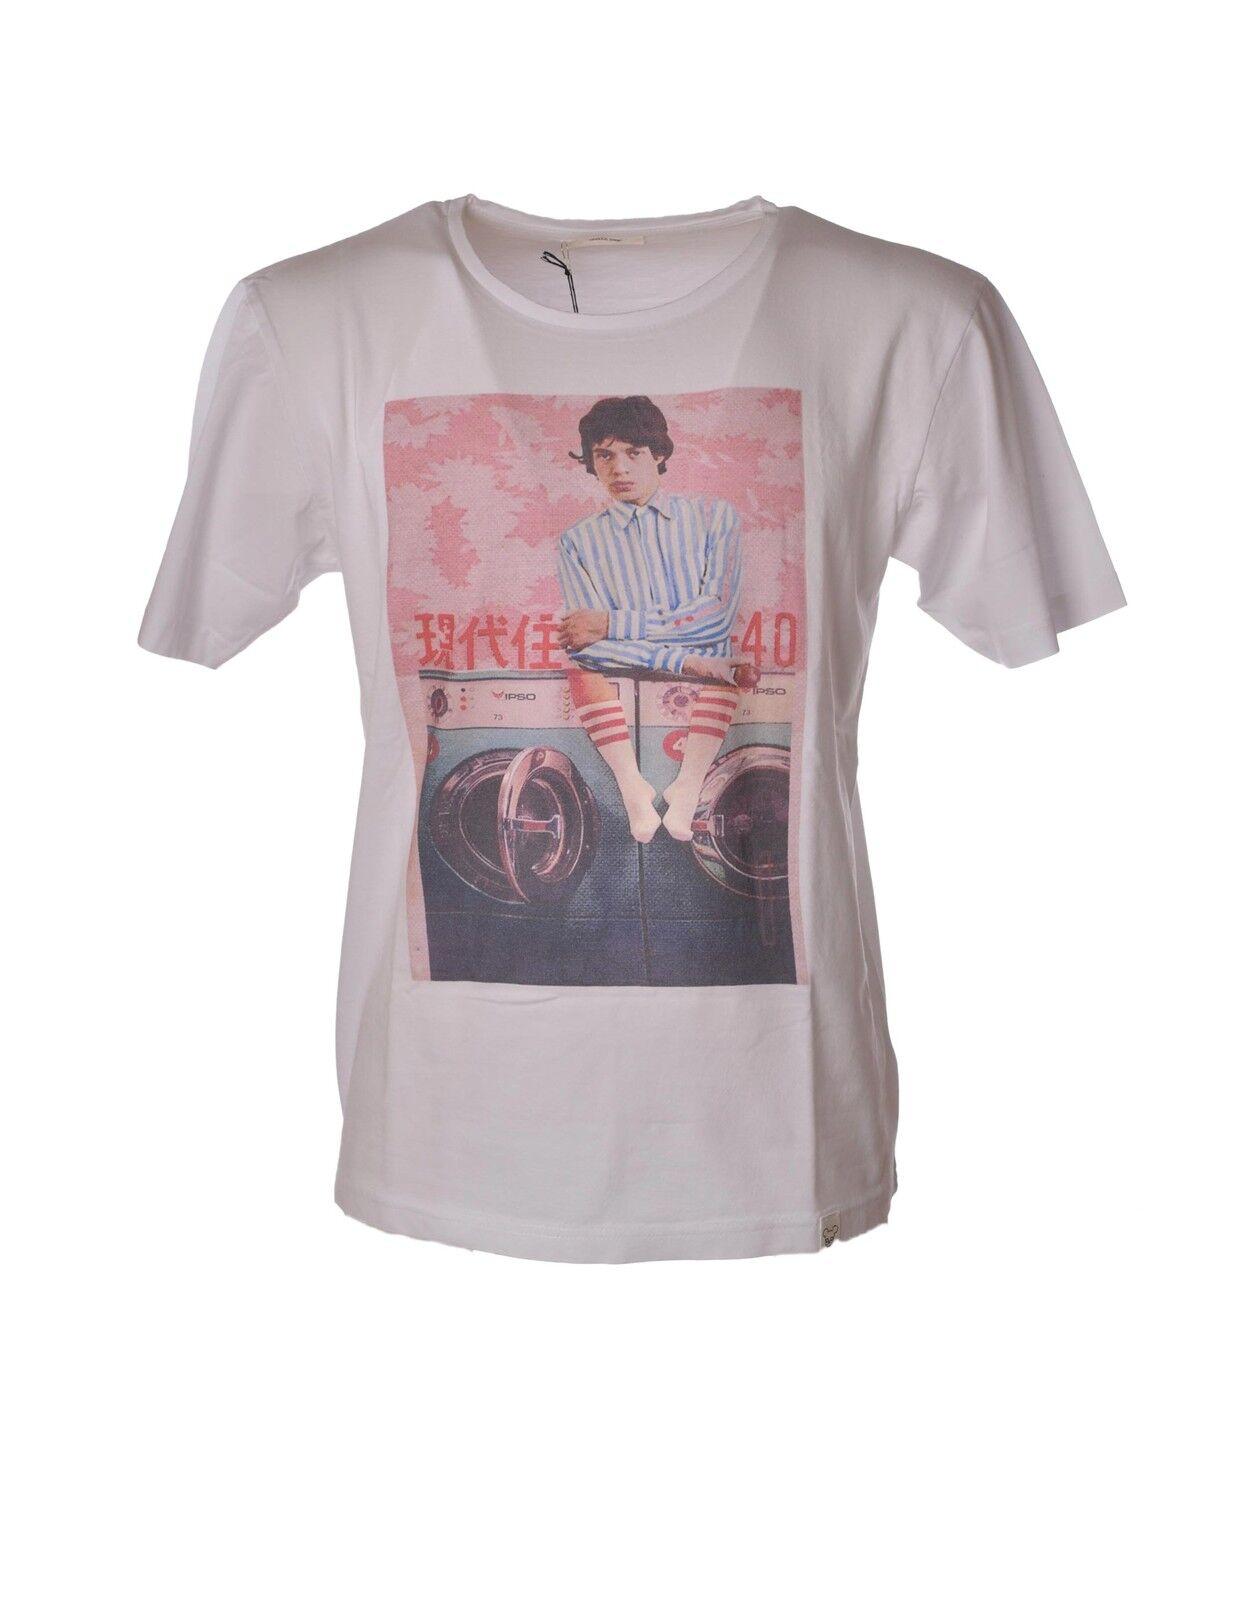 Obvious Basic - Topwear-T-hemds - Man - Weiß - 3815915G181530